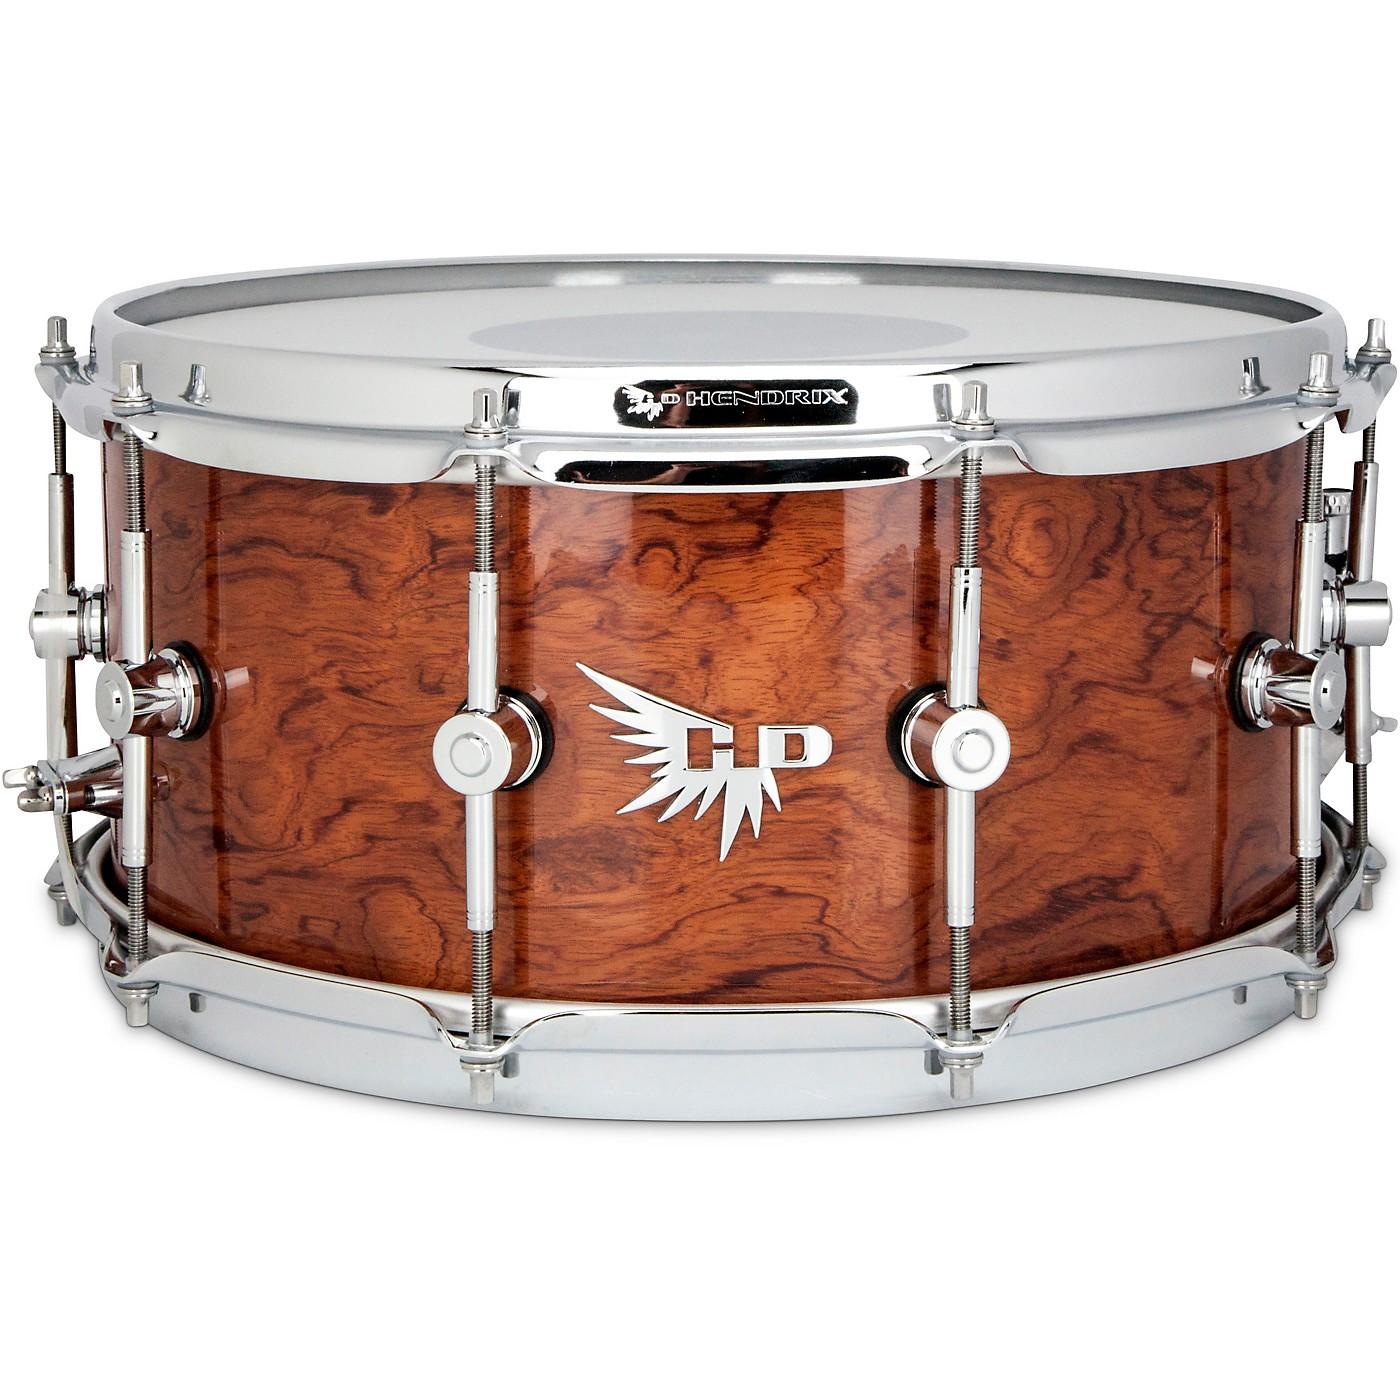 Hendrix Drums Perfect Ply Bubinga Snare Drum thumbnail